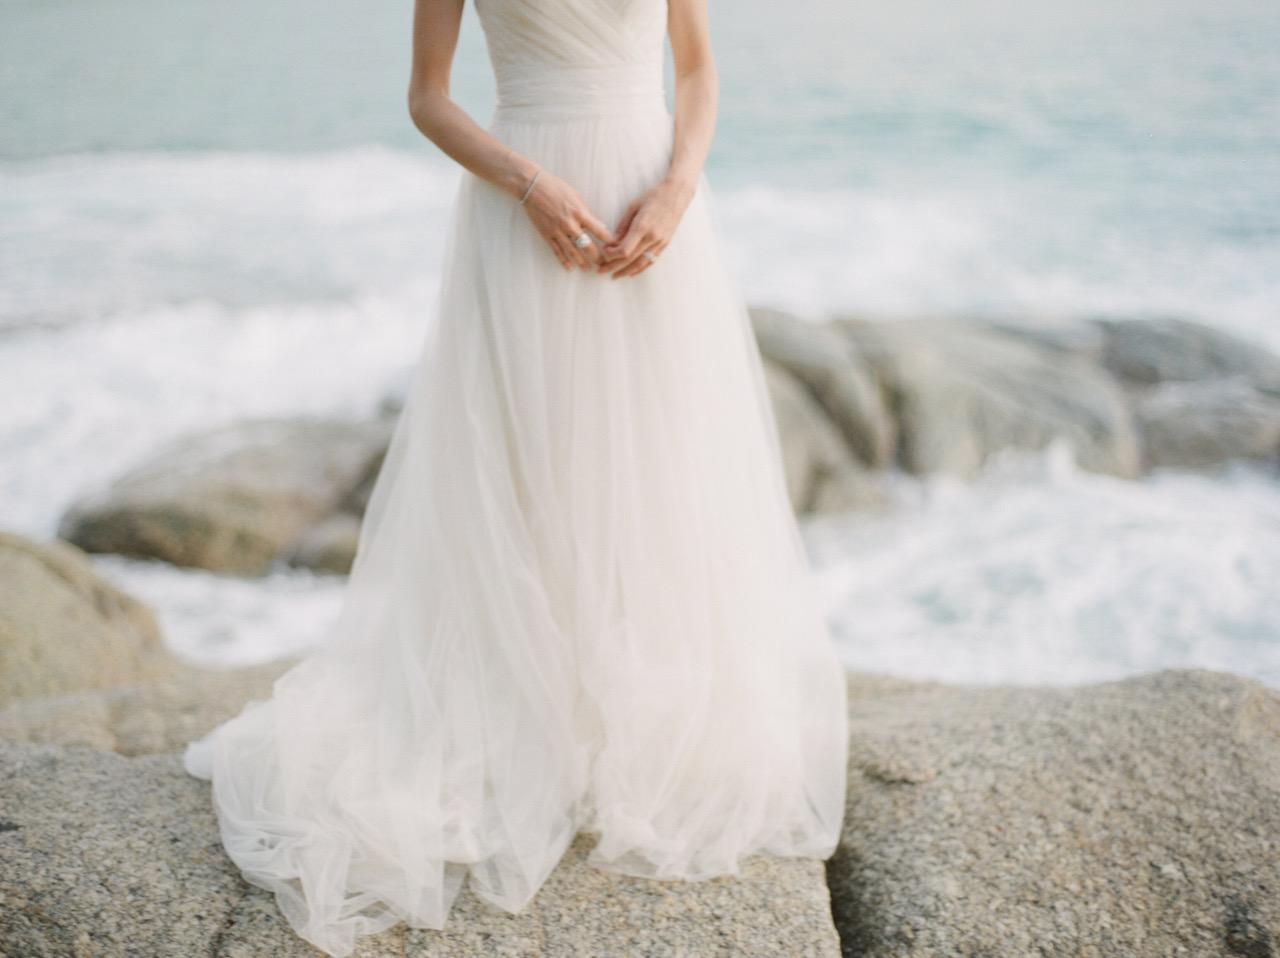 Wedding Planning Timeline - The Wedding Bliss Thailand 4